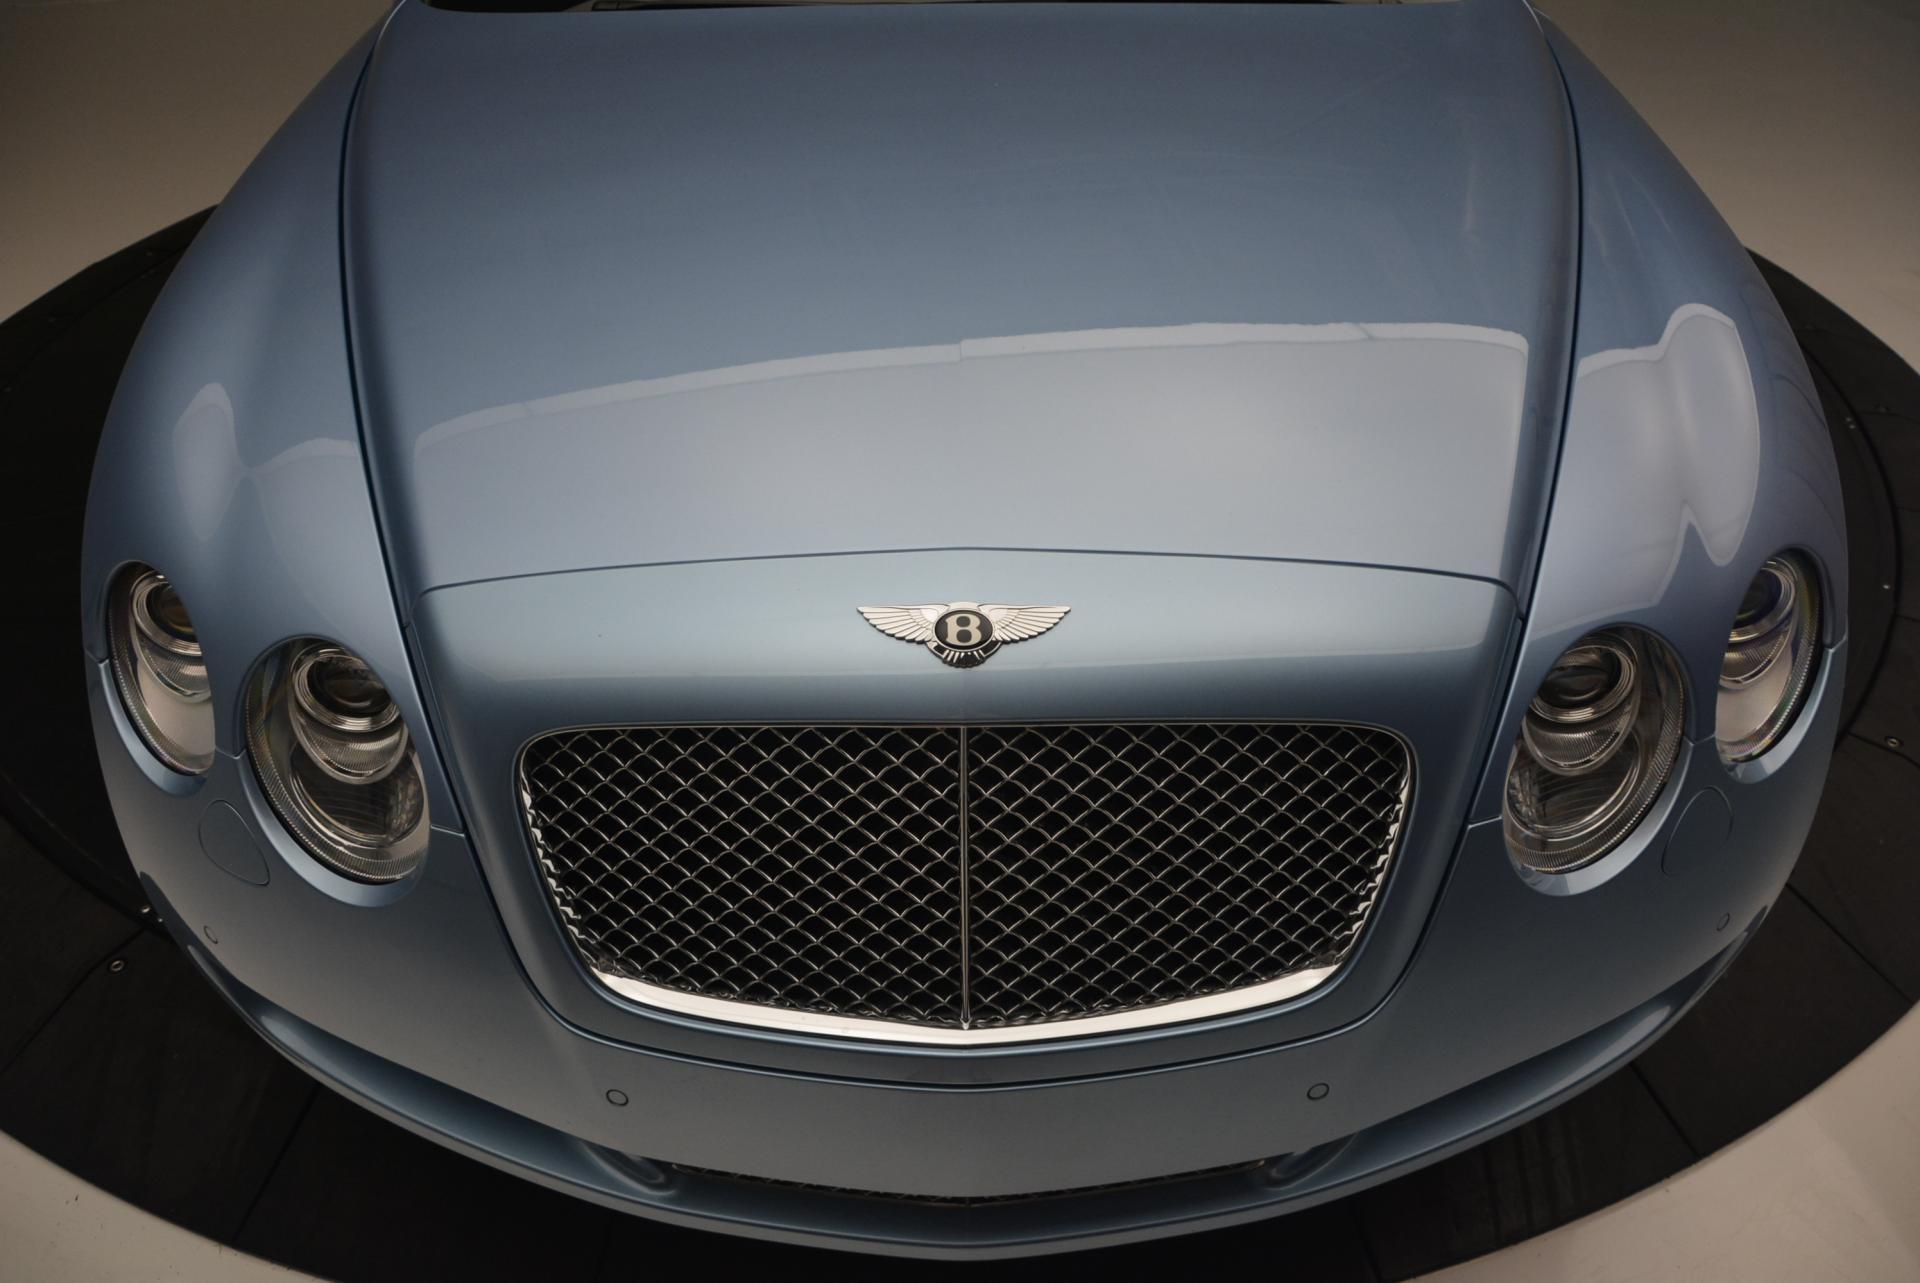 Used 2007 Bentley Continental GTC  For Sale In Westport, CT 495_p24